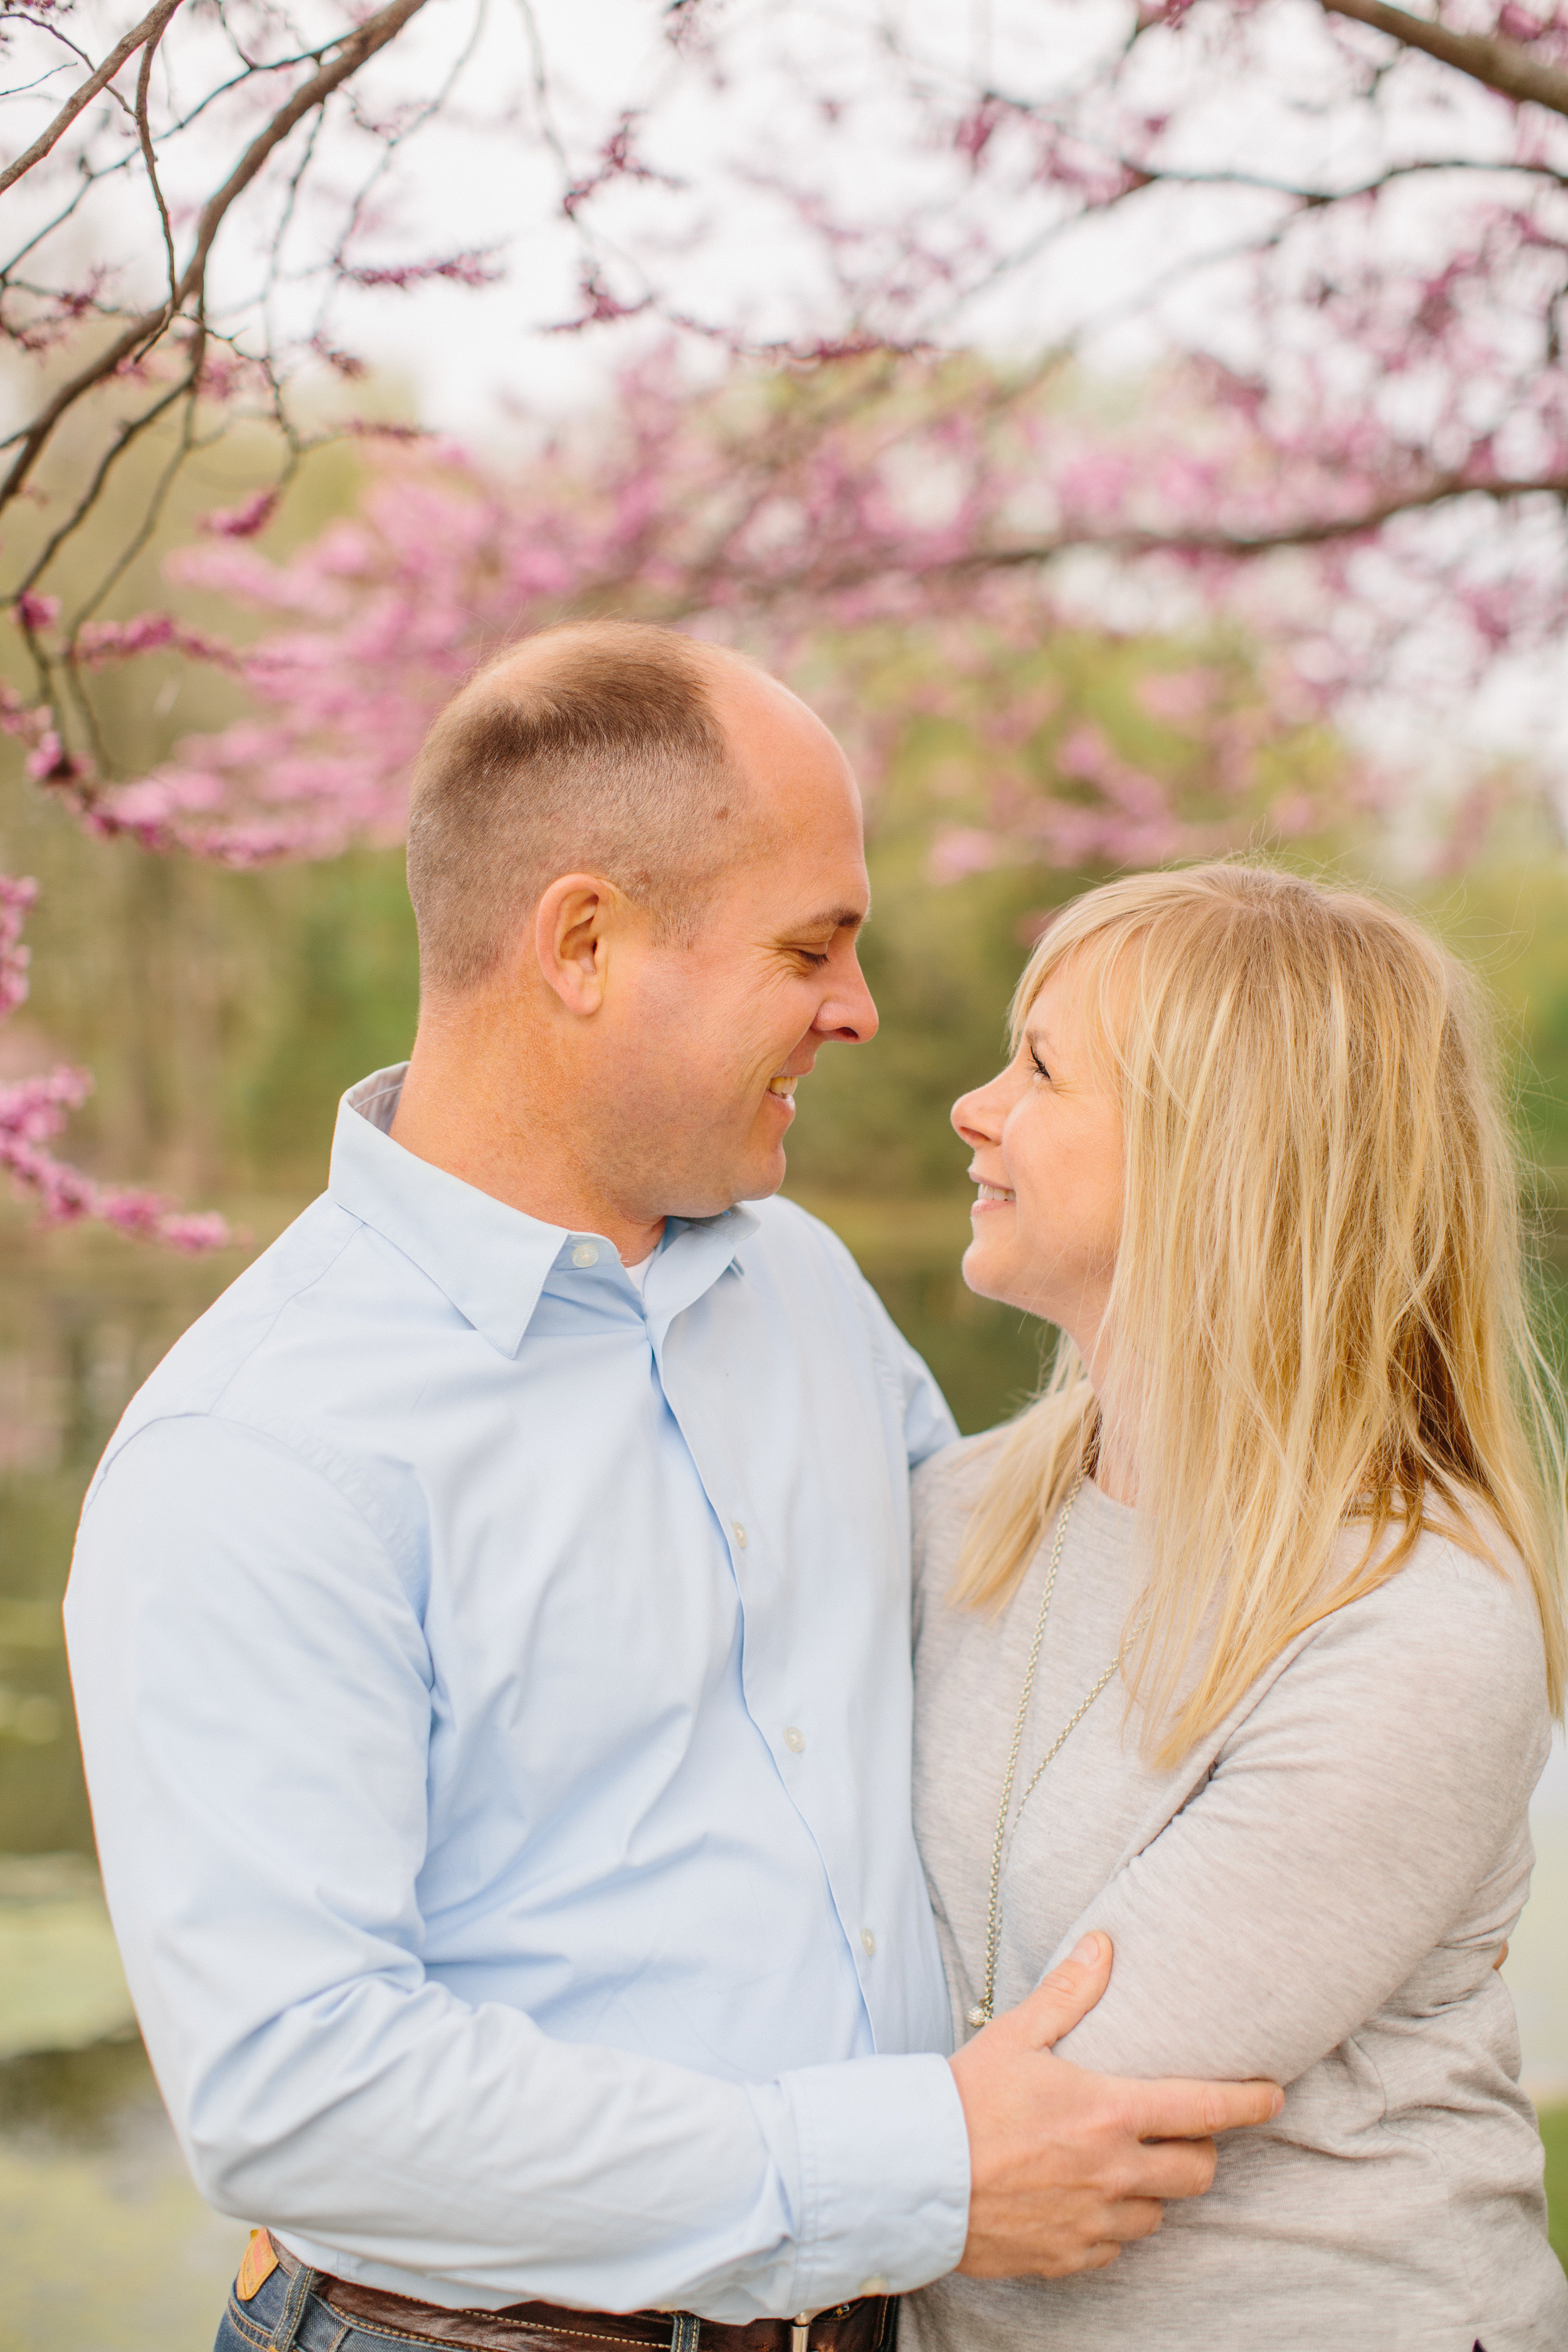 Iowa State University spring wedding photography